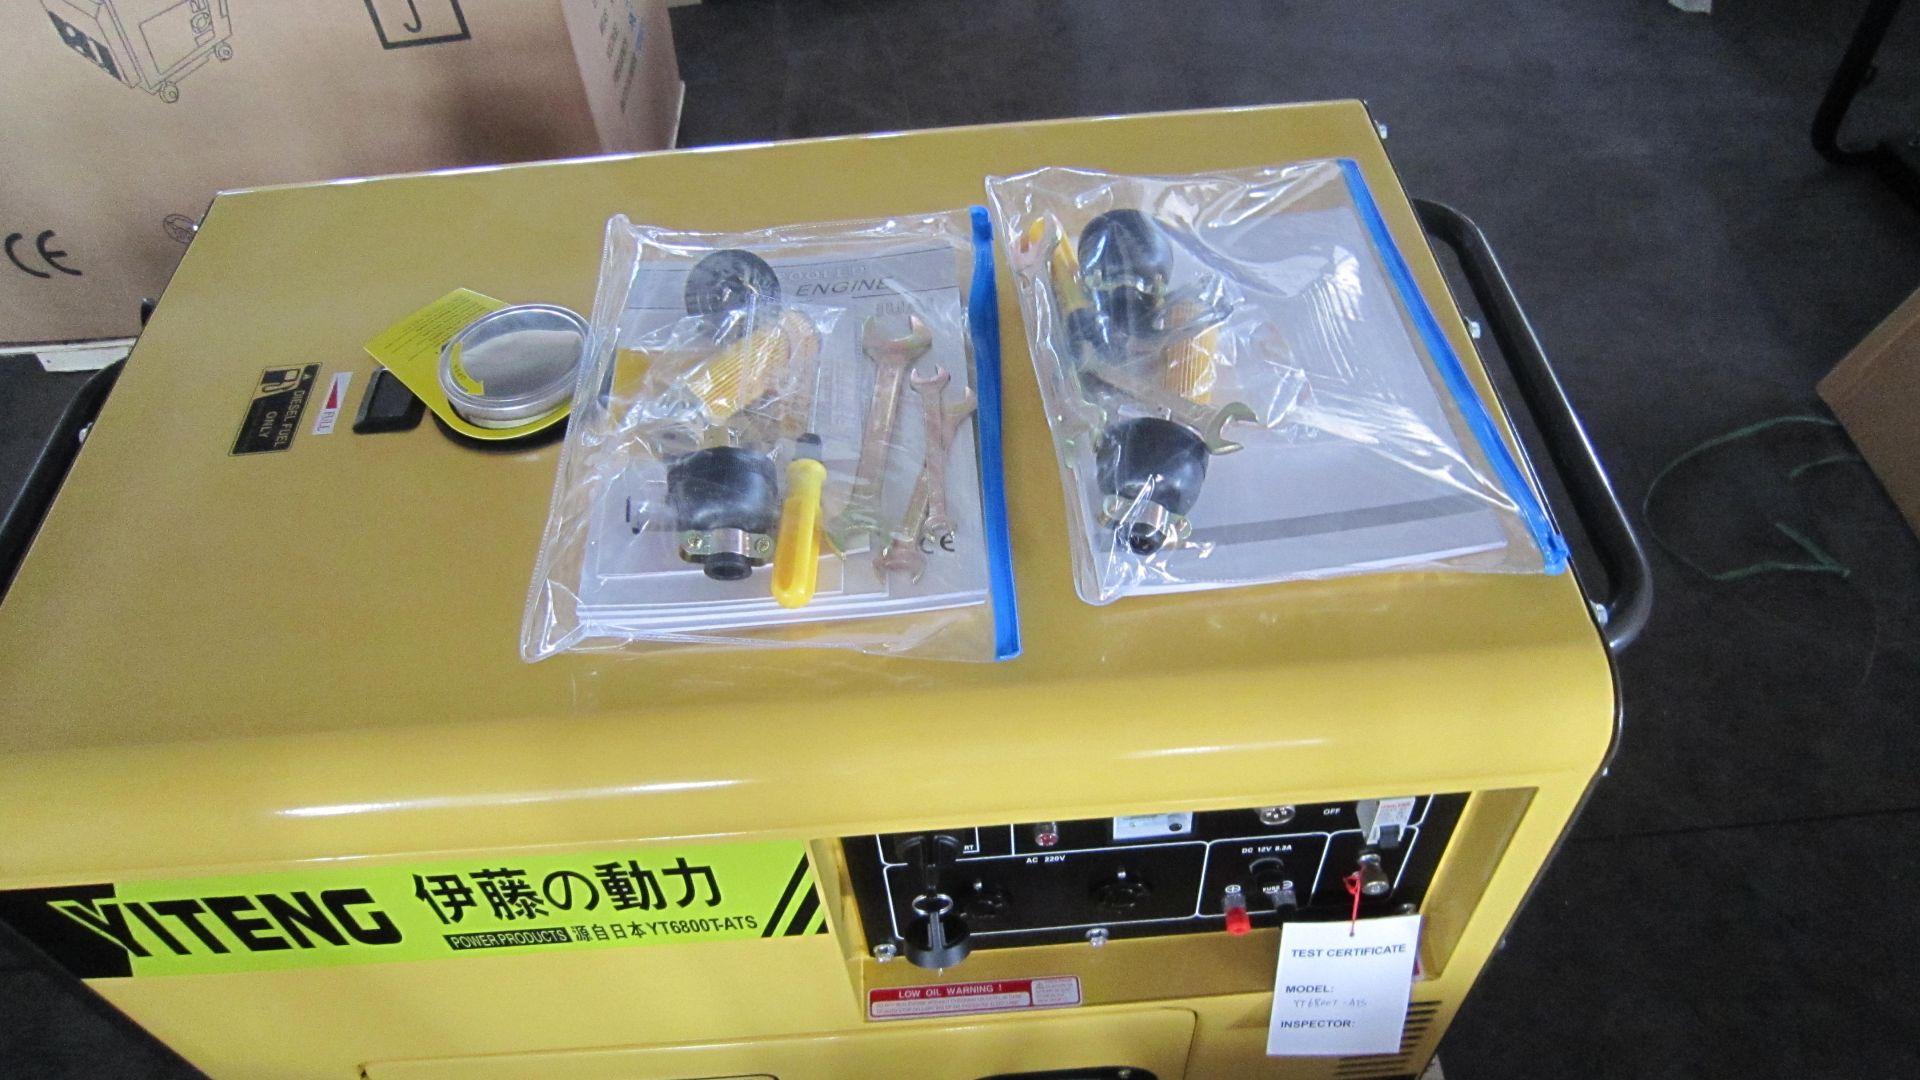 5kw全自动柴油发电机 伊藤yt6800t-ats